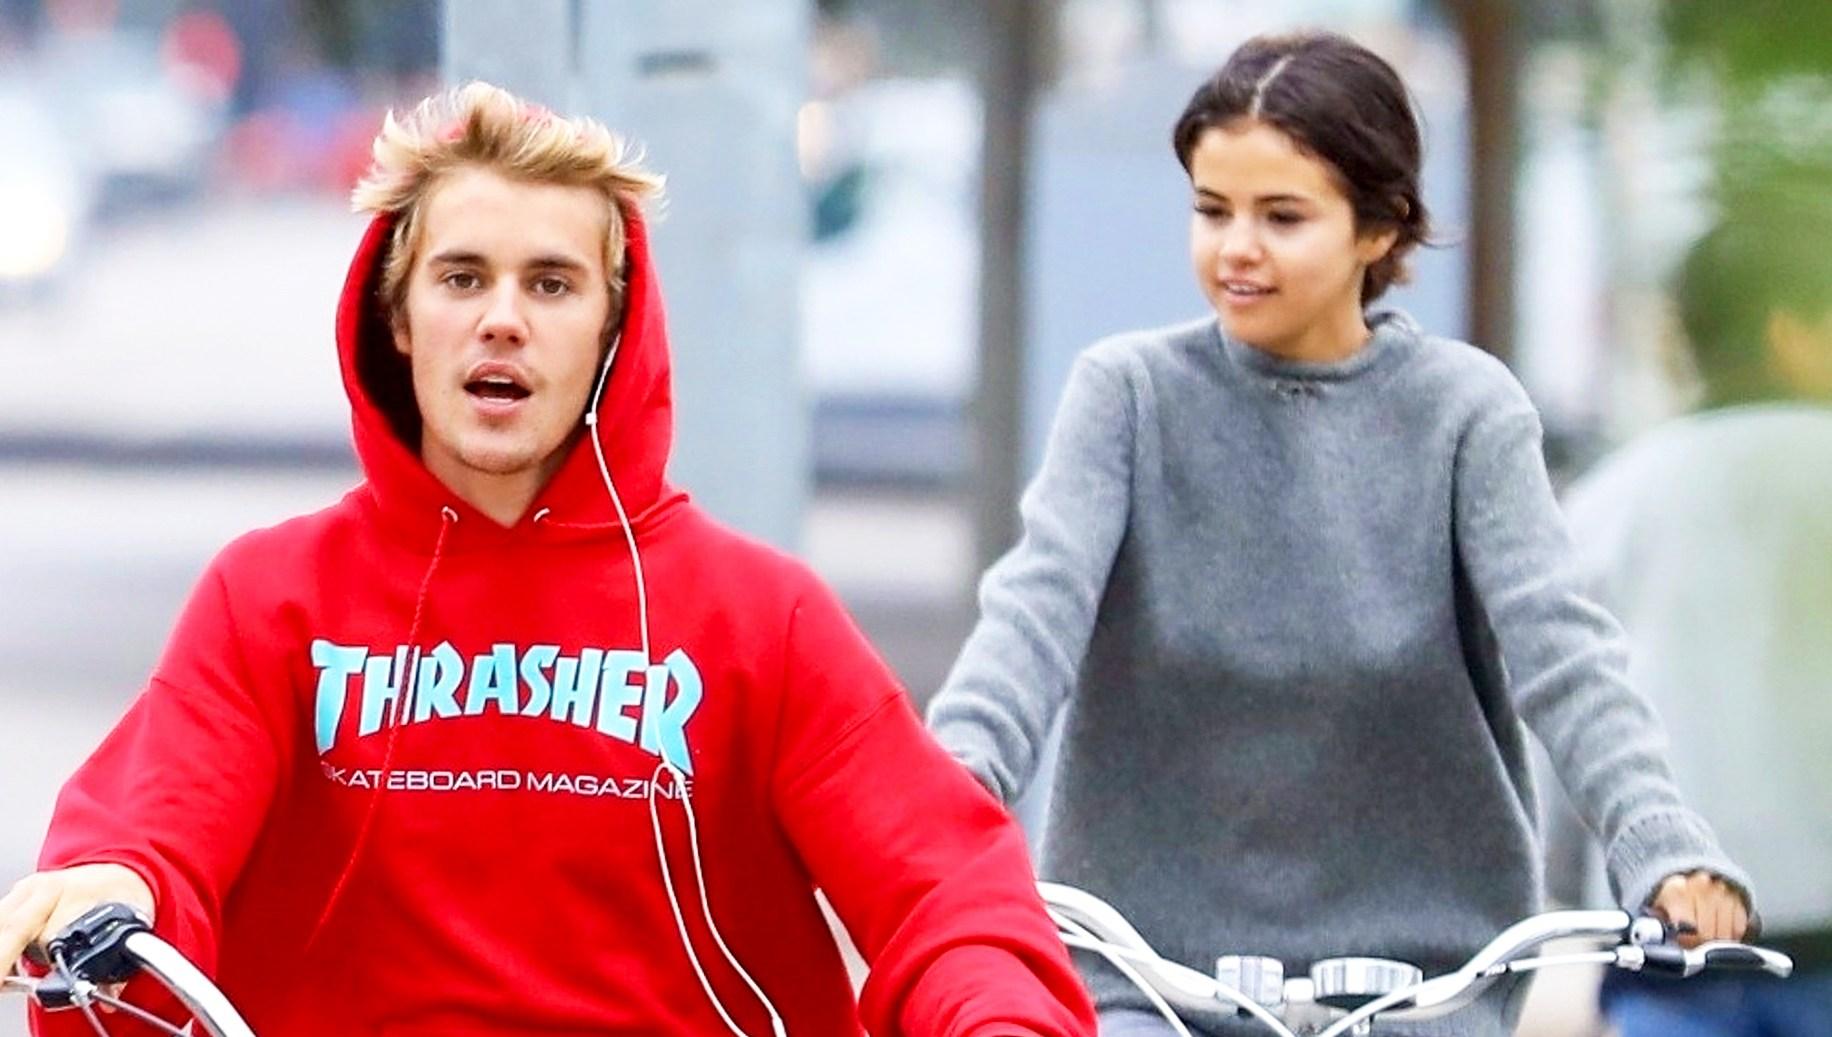 Justin Bieber and Selena Gomez ride bikes in Los Angeles on November 1, 2017.